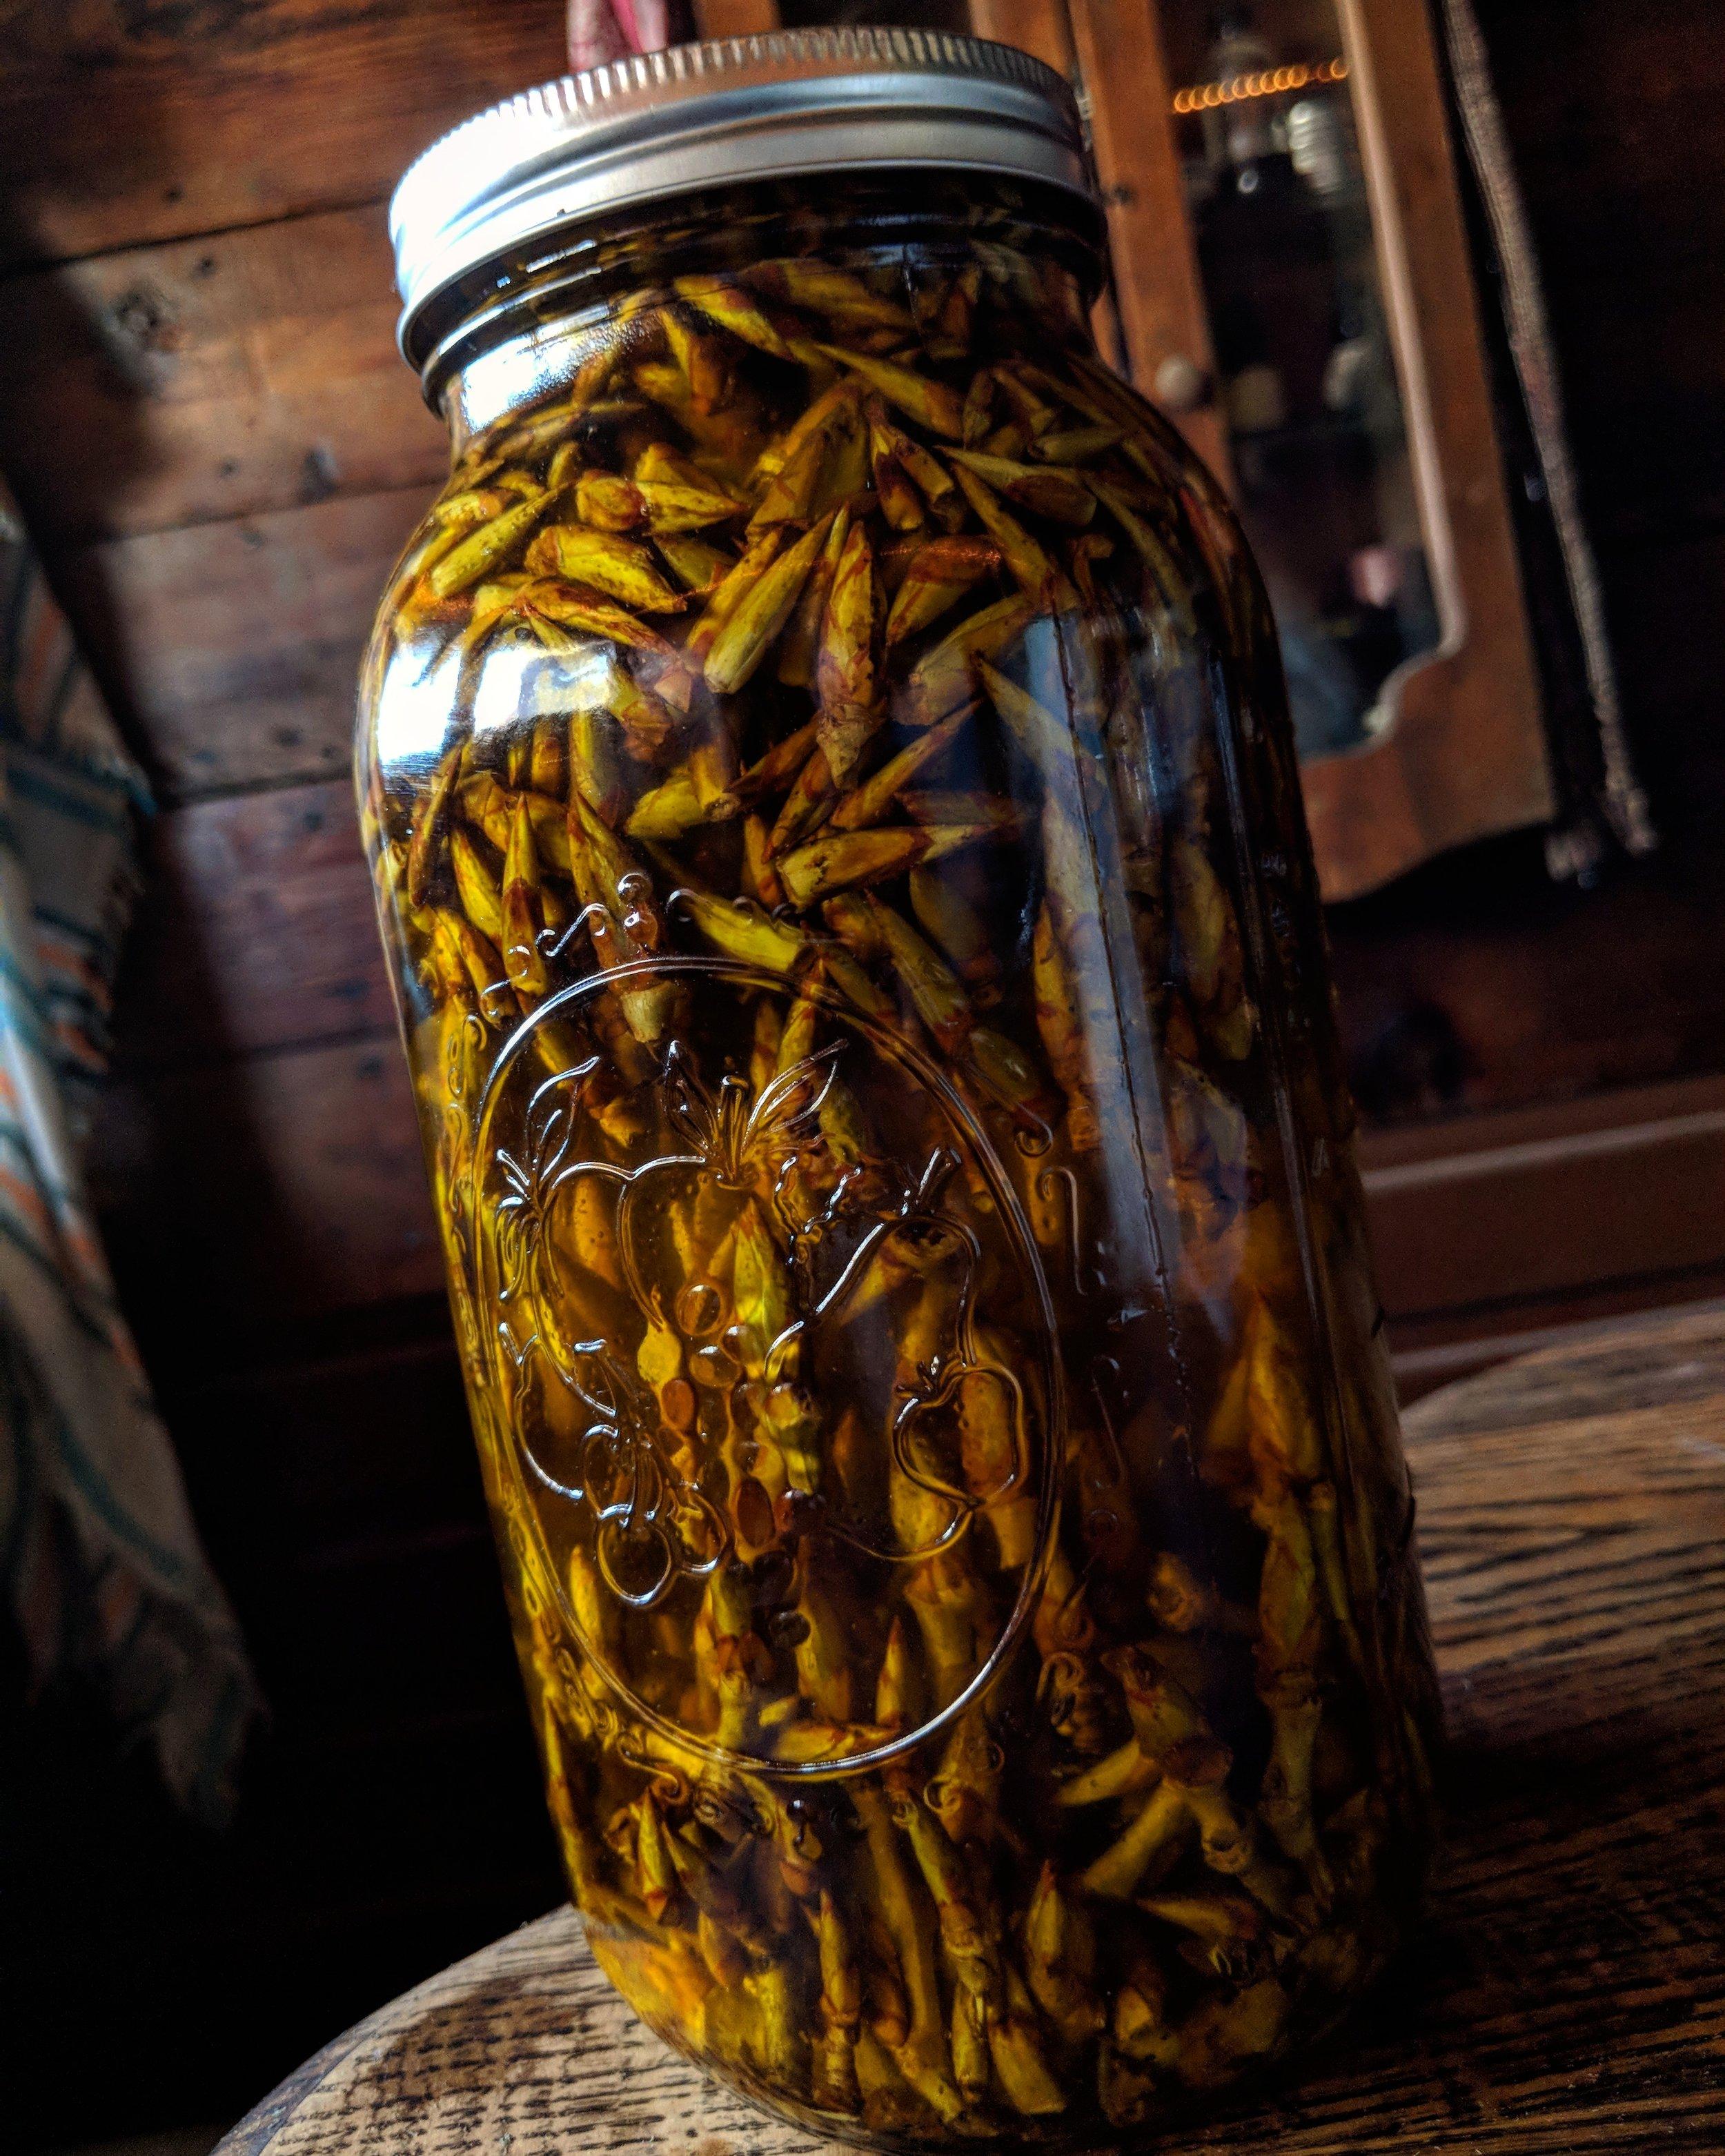 Poplar buds infusing in rich Avocado oil.